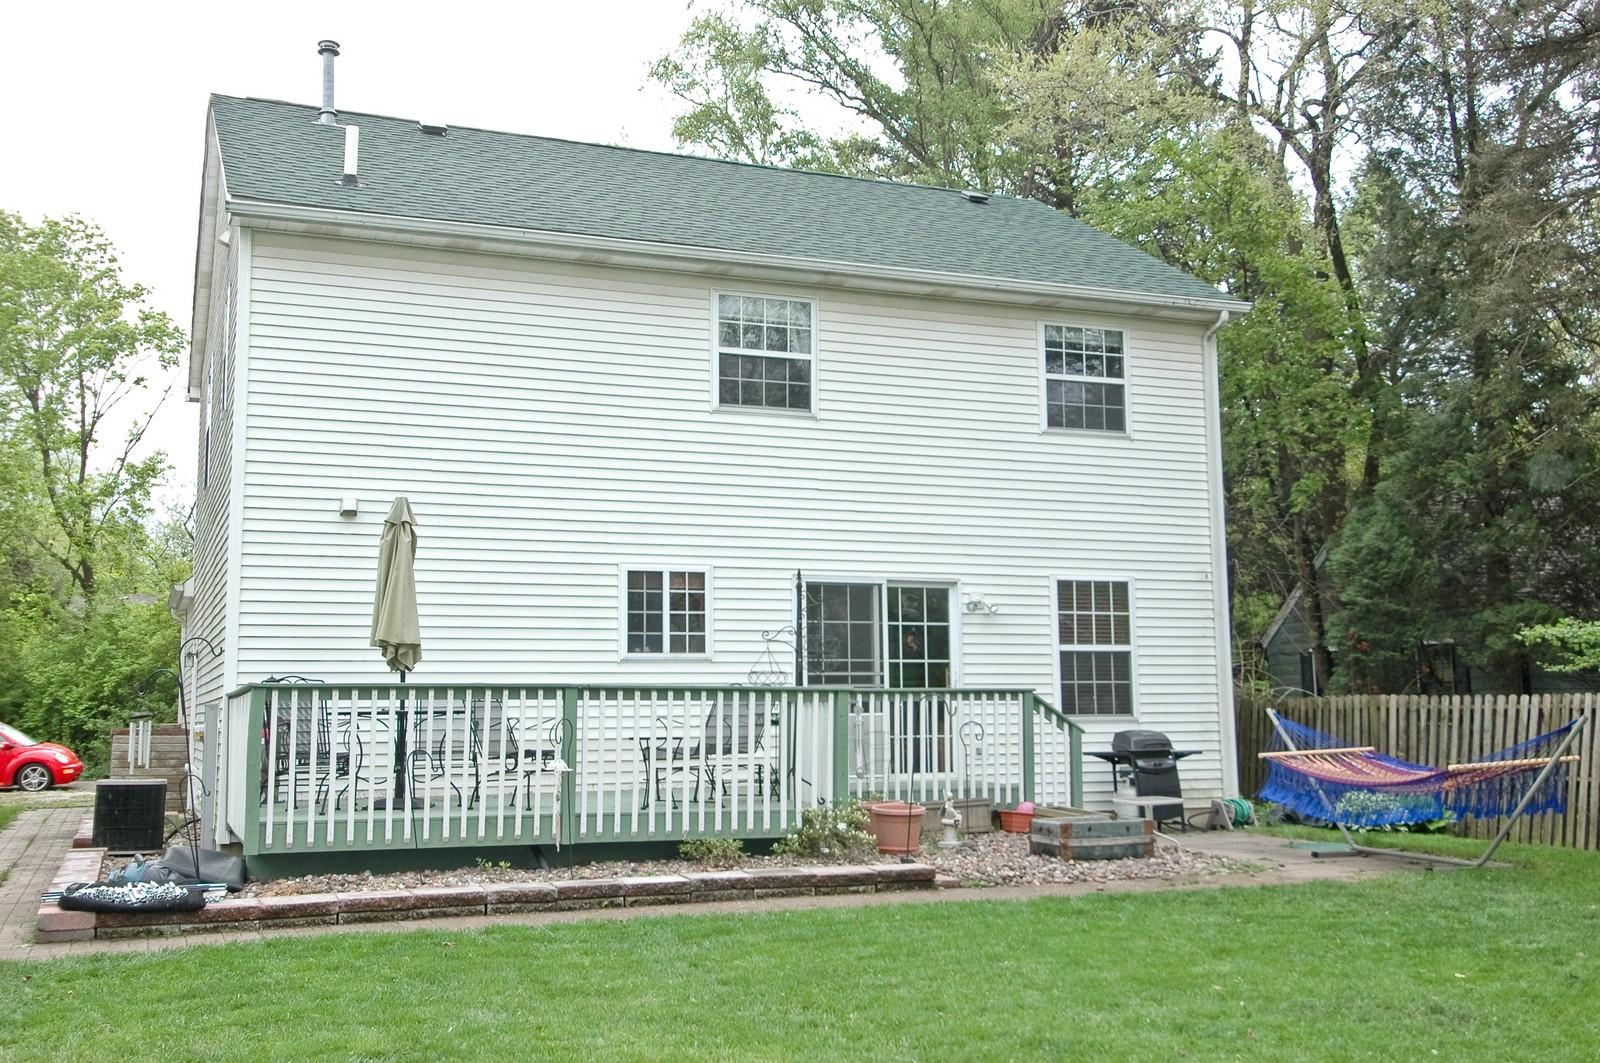 Real Estate Photography - 10315 Wilmette, Algonquin, IL, 60102 - Rear View